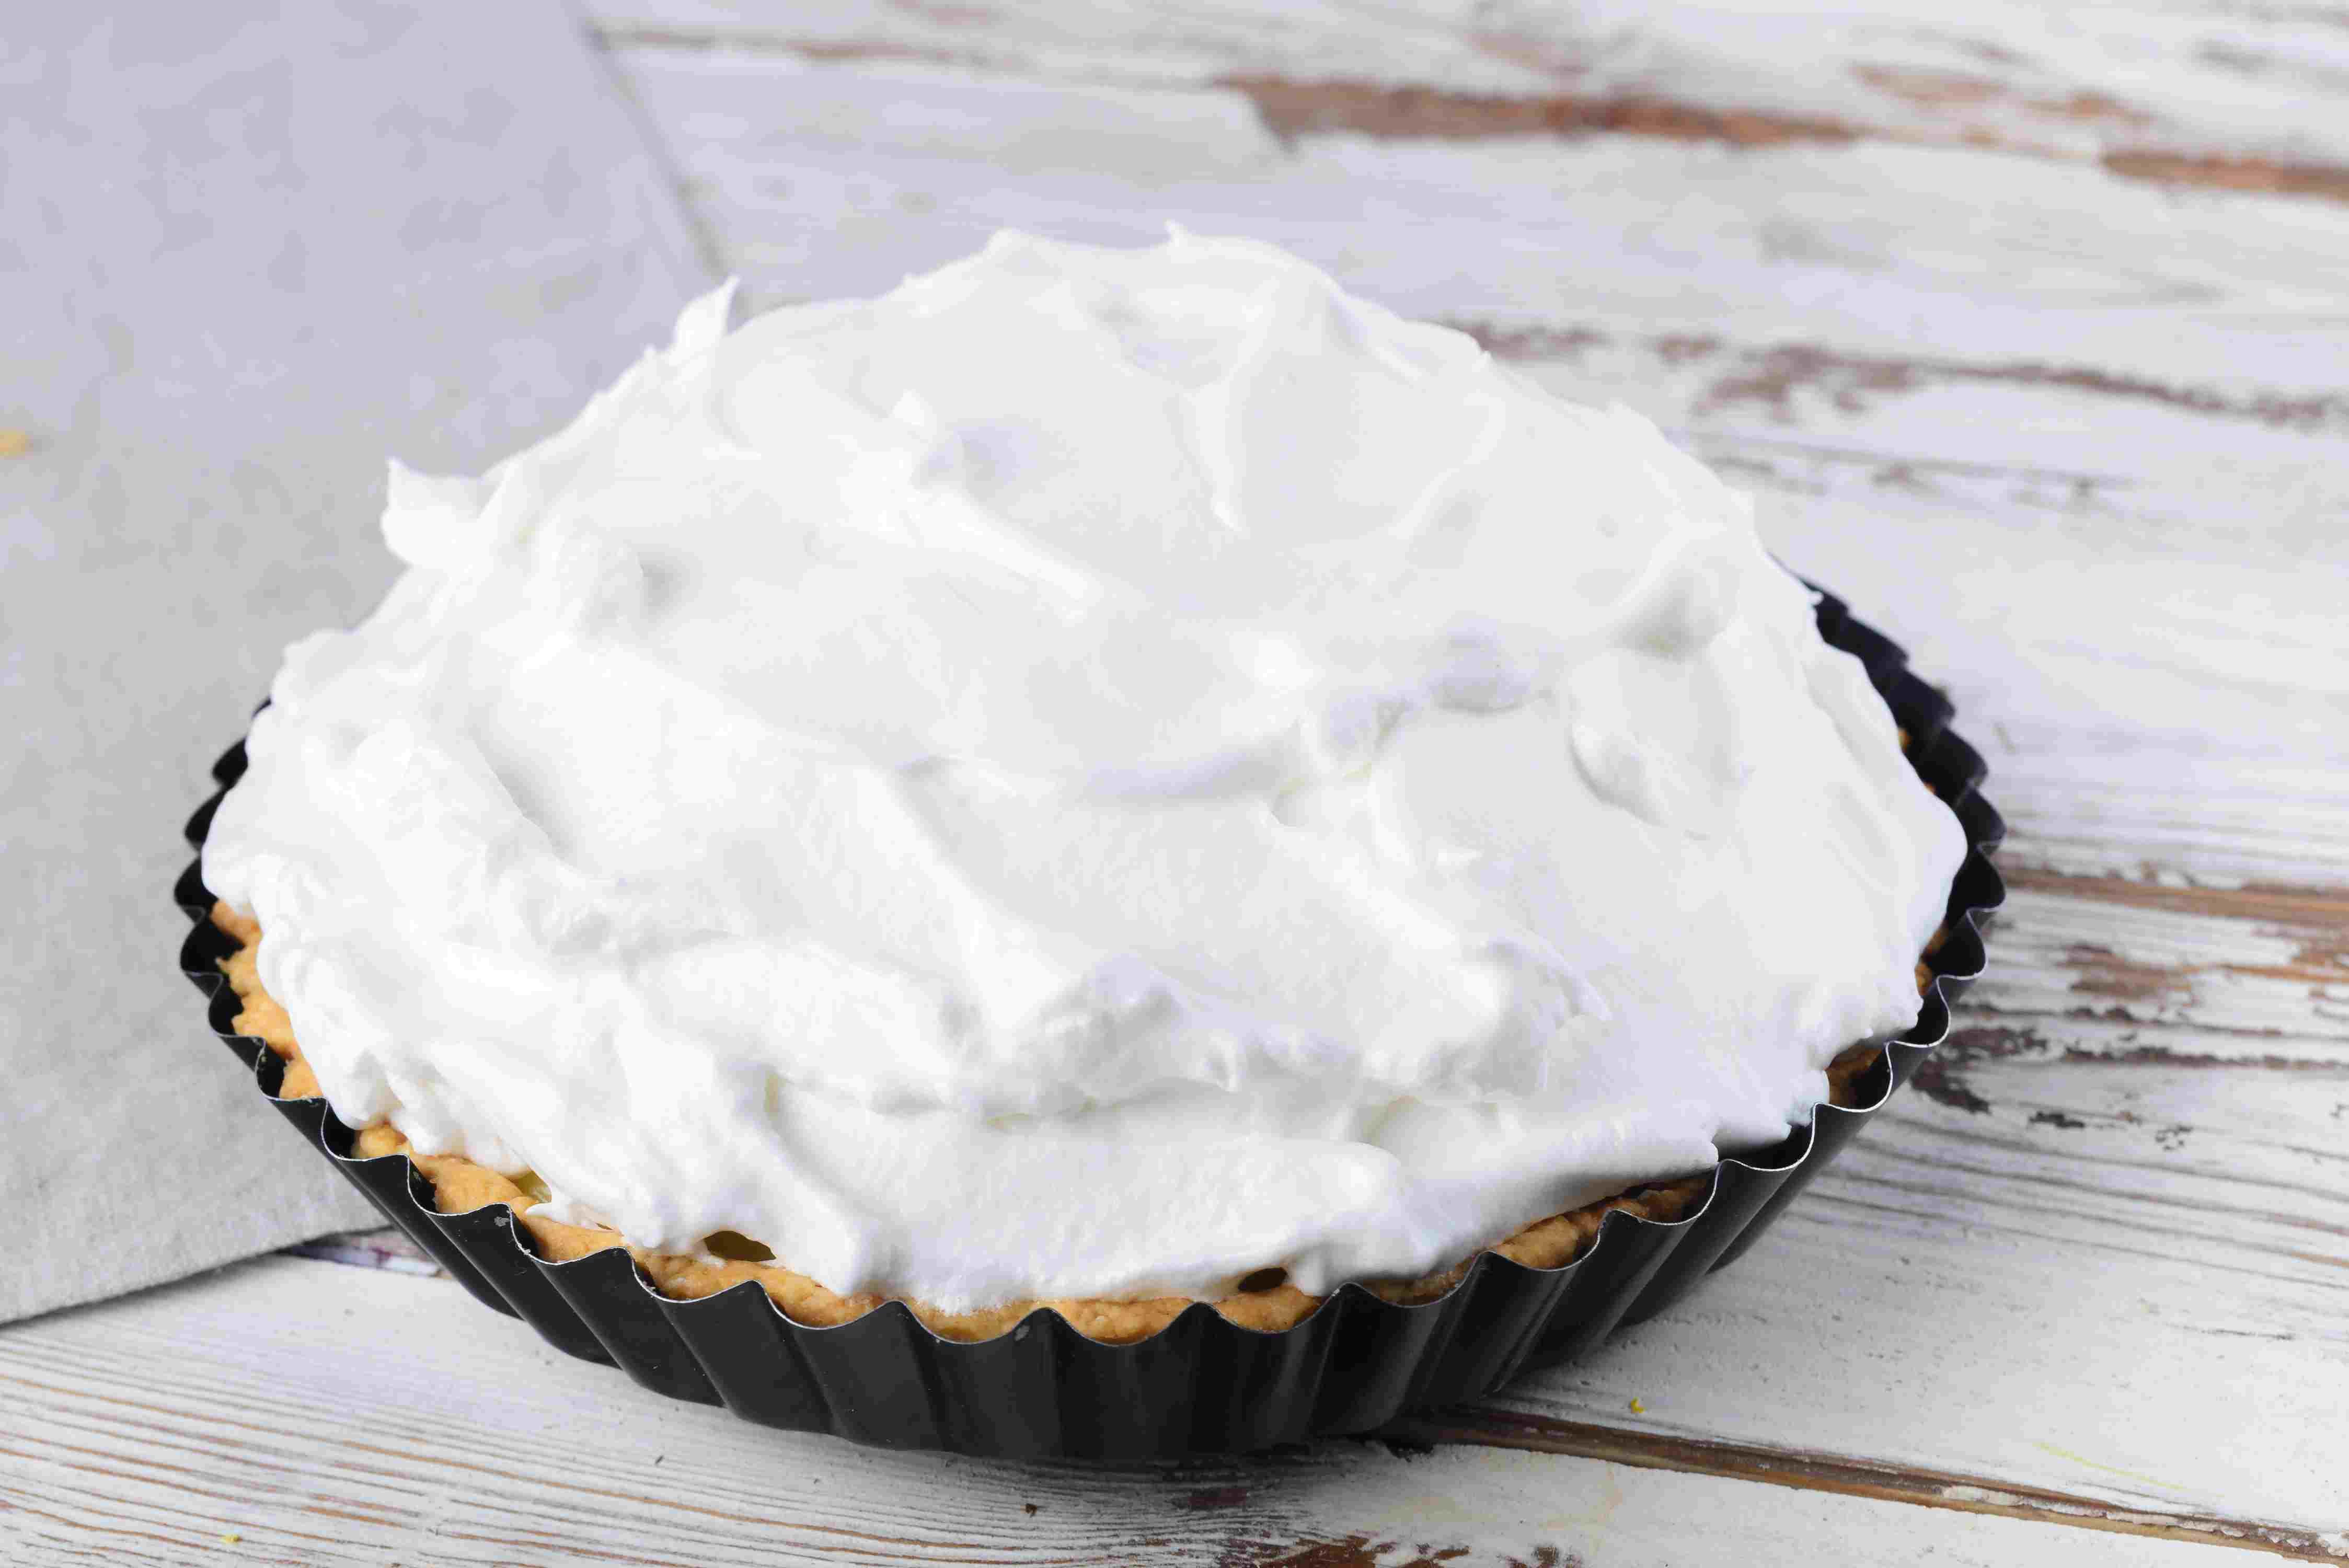 Top pie with meringue